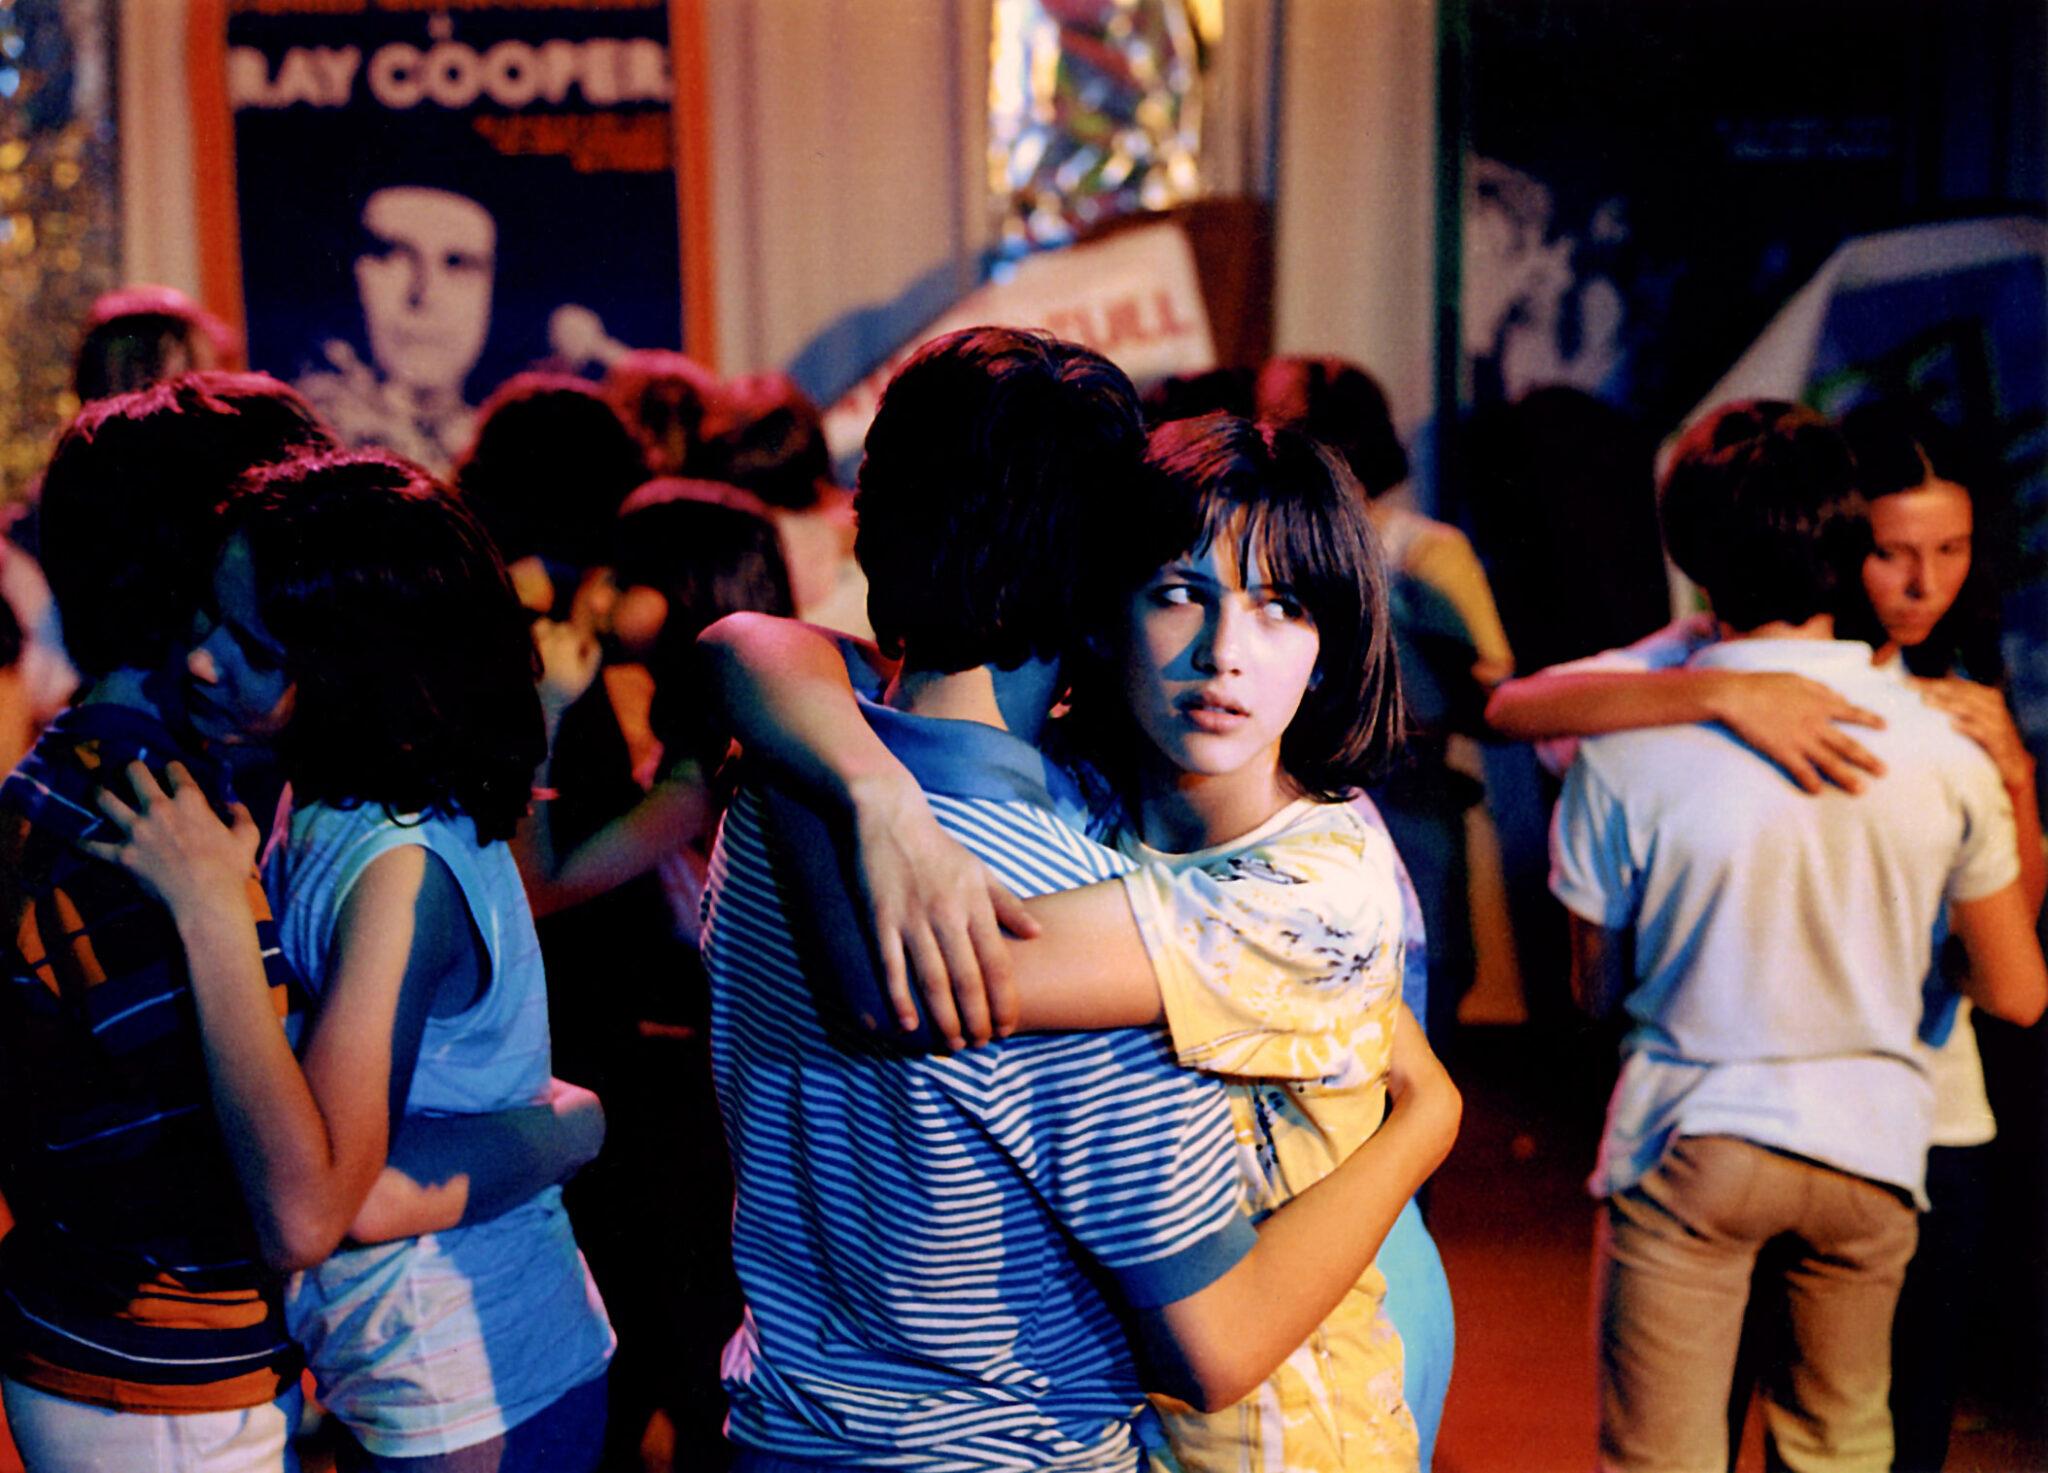 La Boum gilt wohl als absoluter Klassiker unter den Coming-of-Age-Filmen - Hier tanzen Vic und Mathieu innig © La Bäm Filmverleih© La Bäm Filmverleih